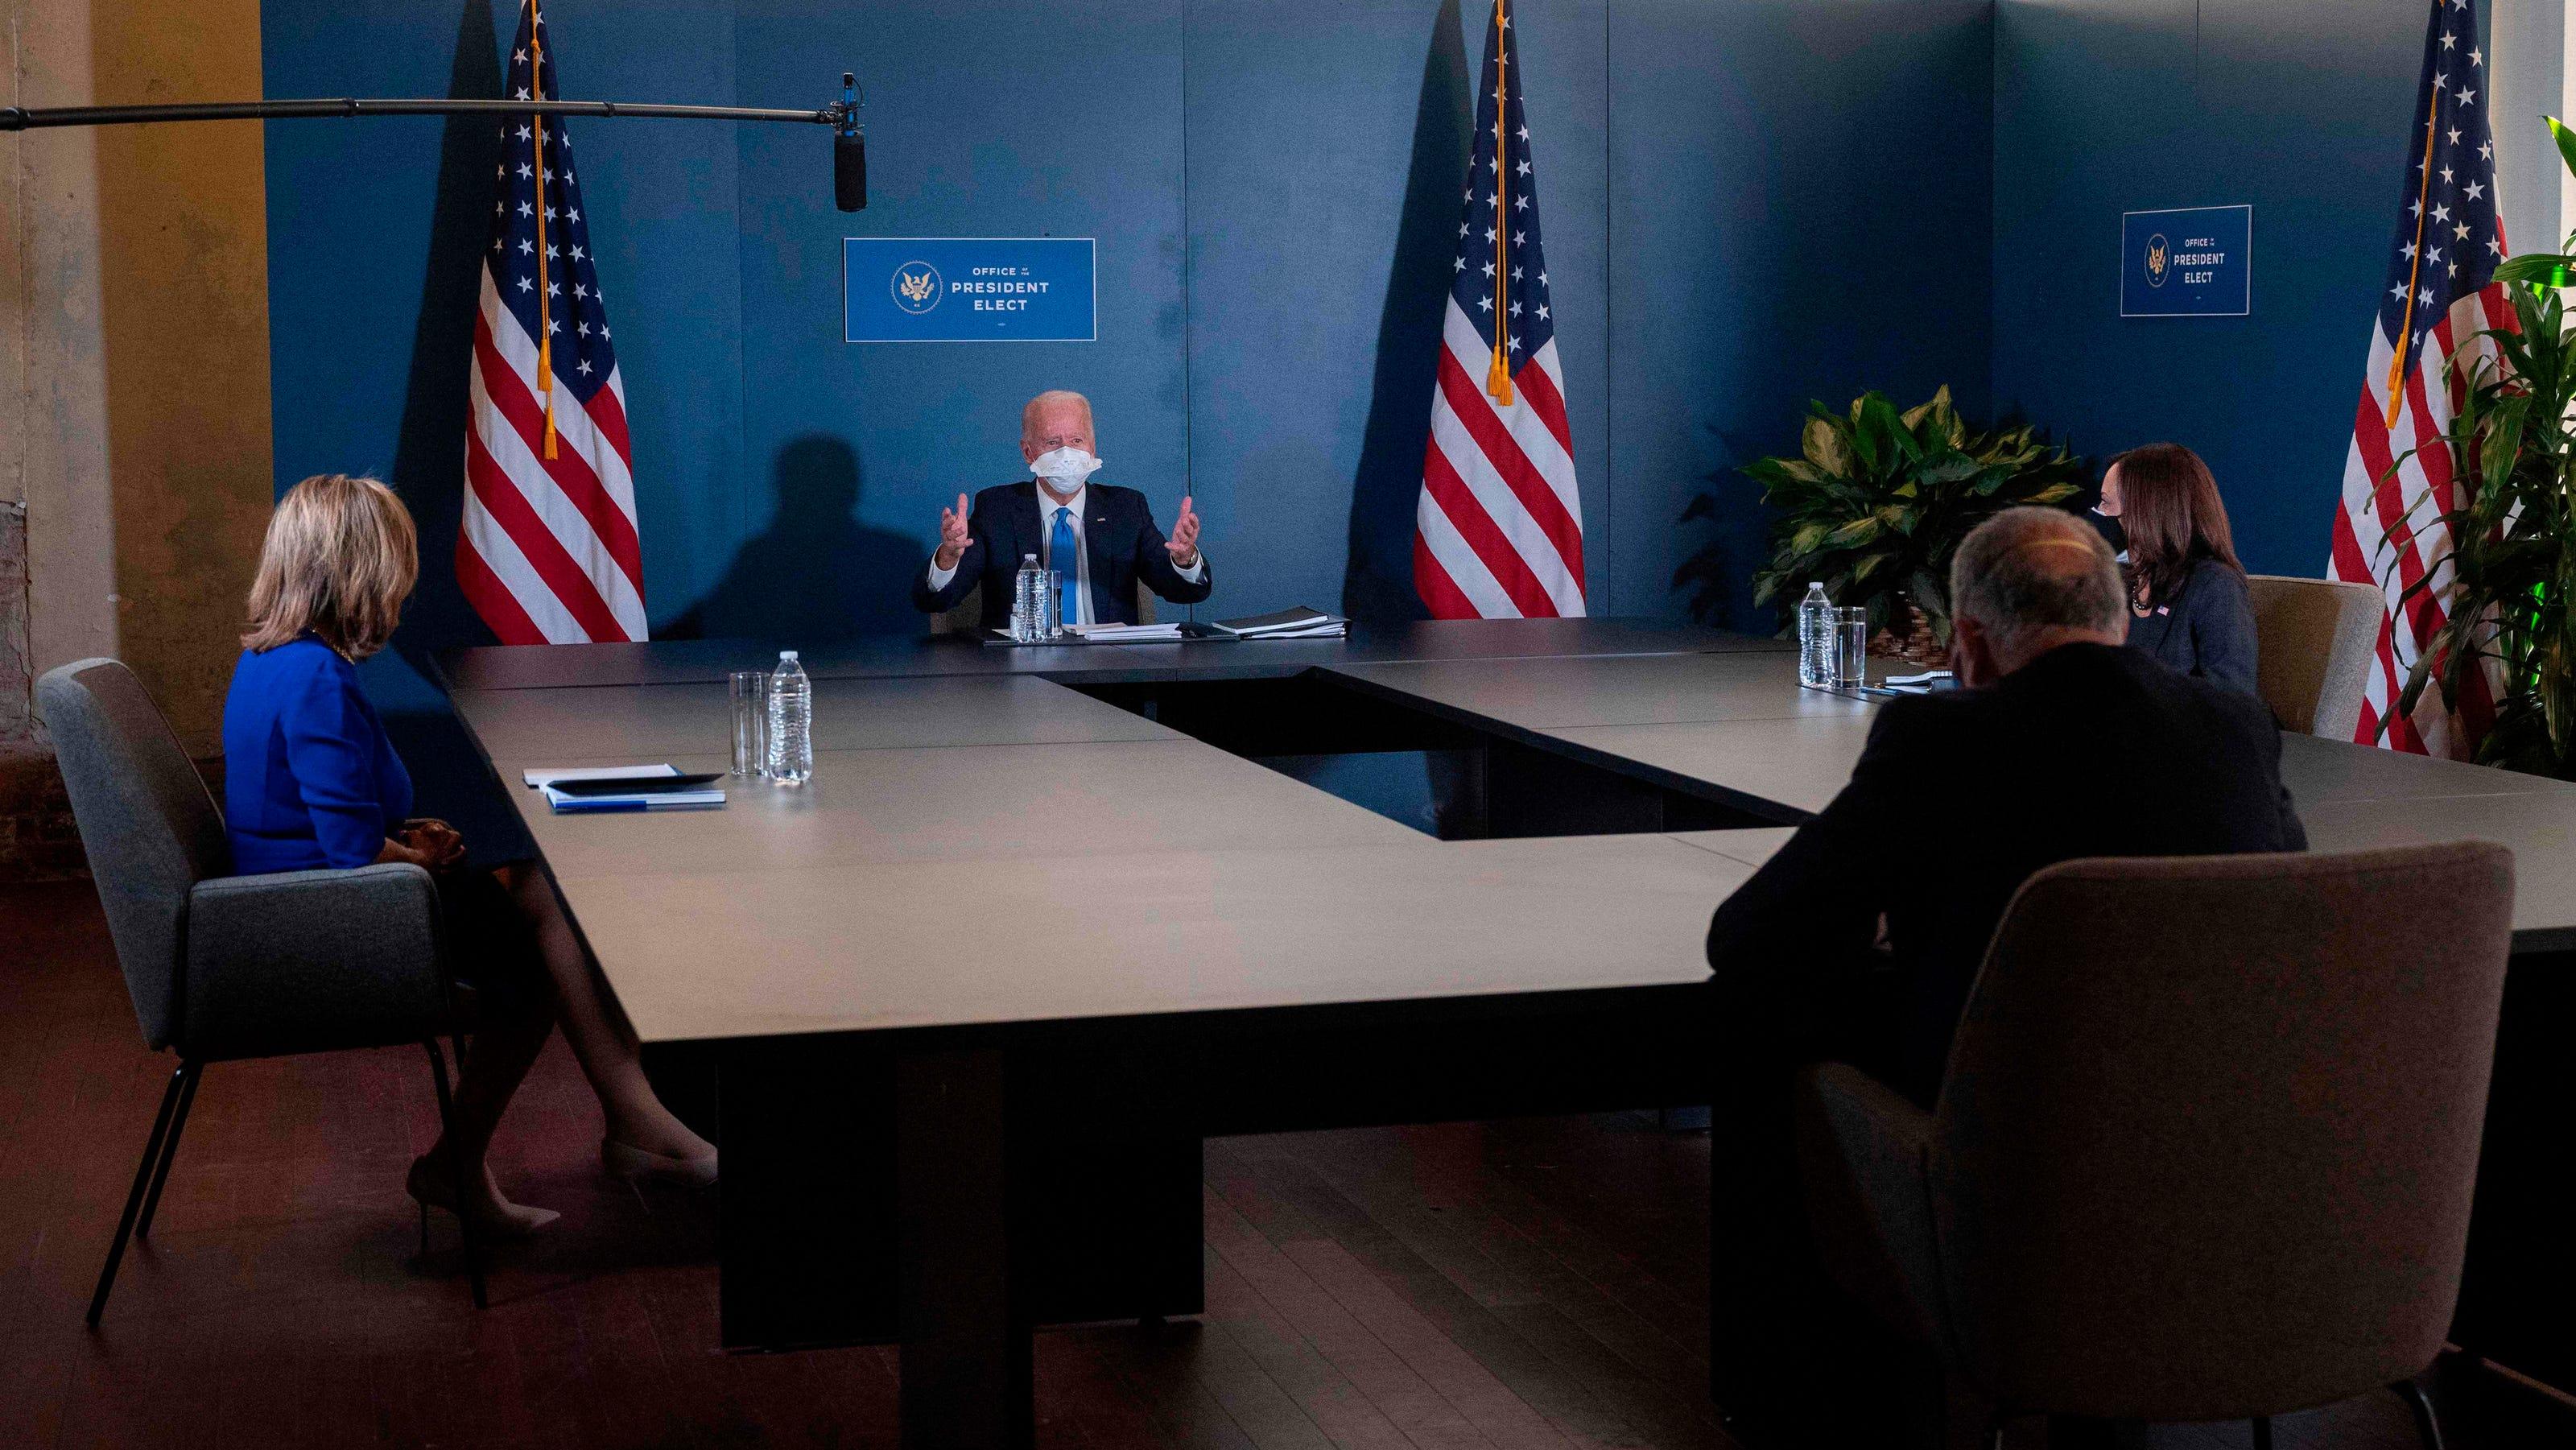 Biden, leading Democrats on board with the new $908 billion bipartisan stimulus proposal